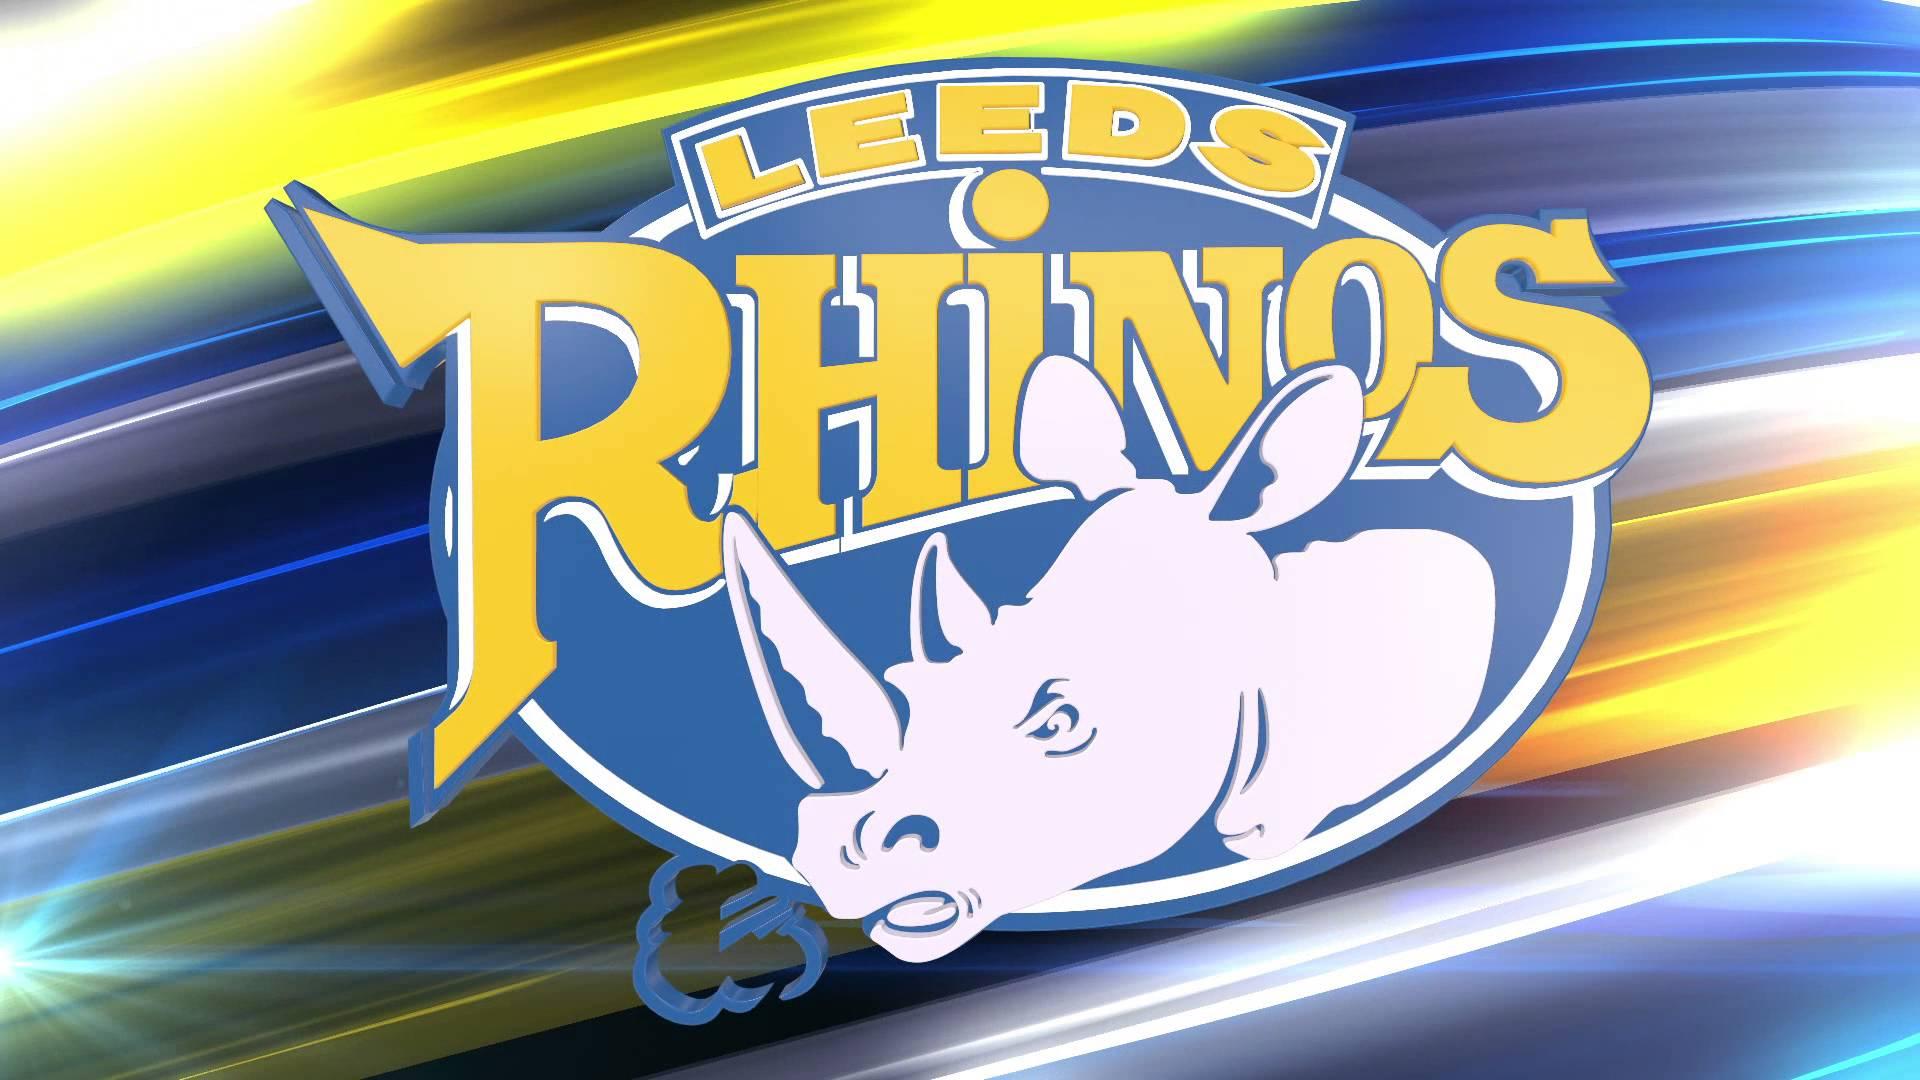 Live Leeds Rhinos